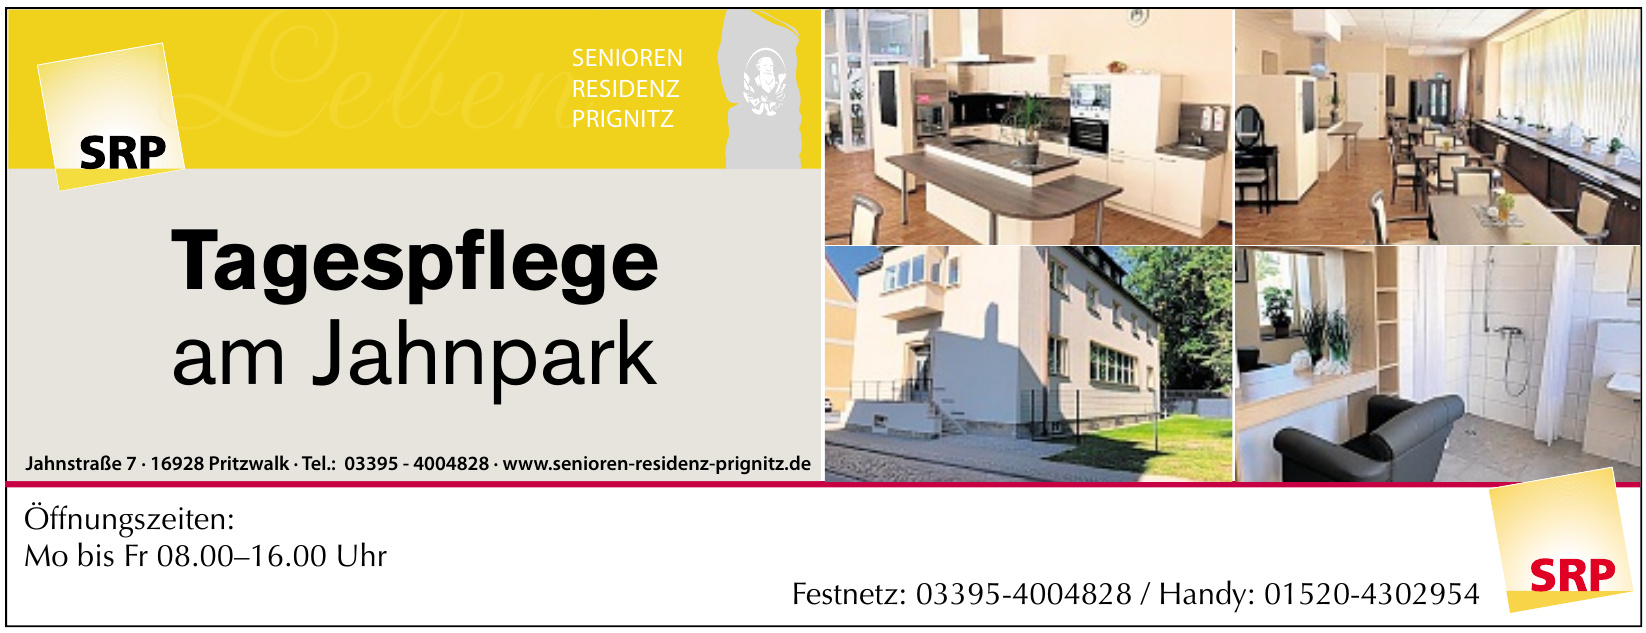 SRP Senioren Residenz Prignitz